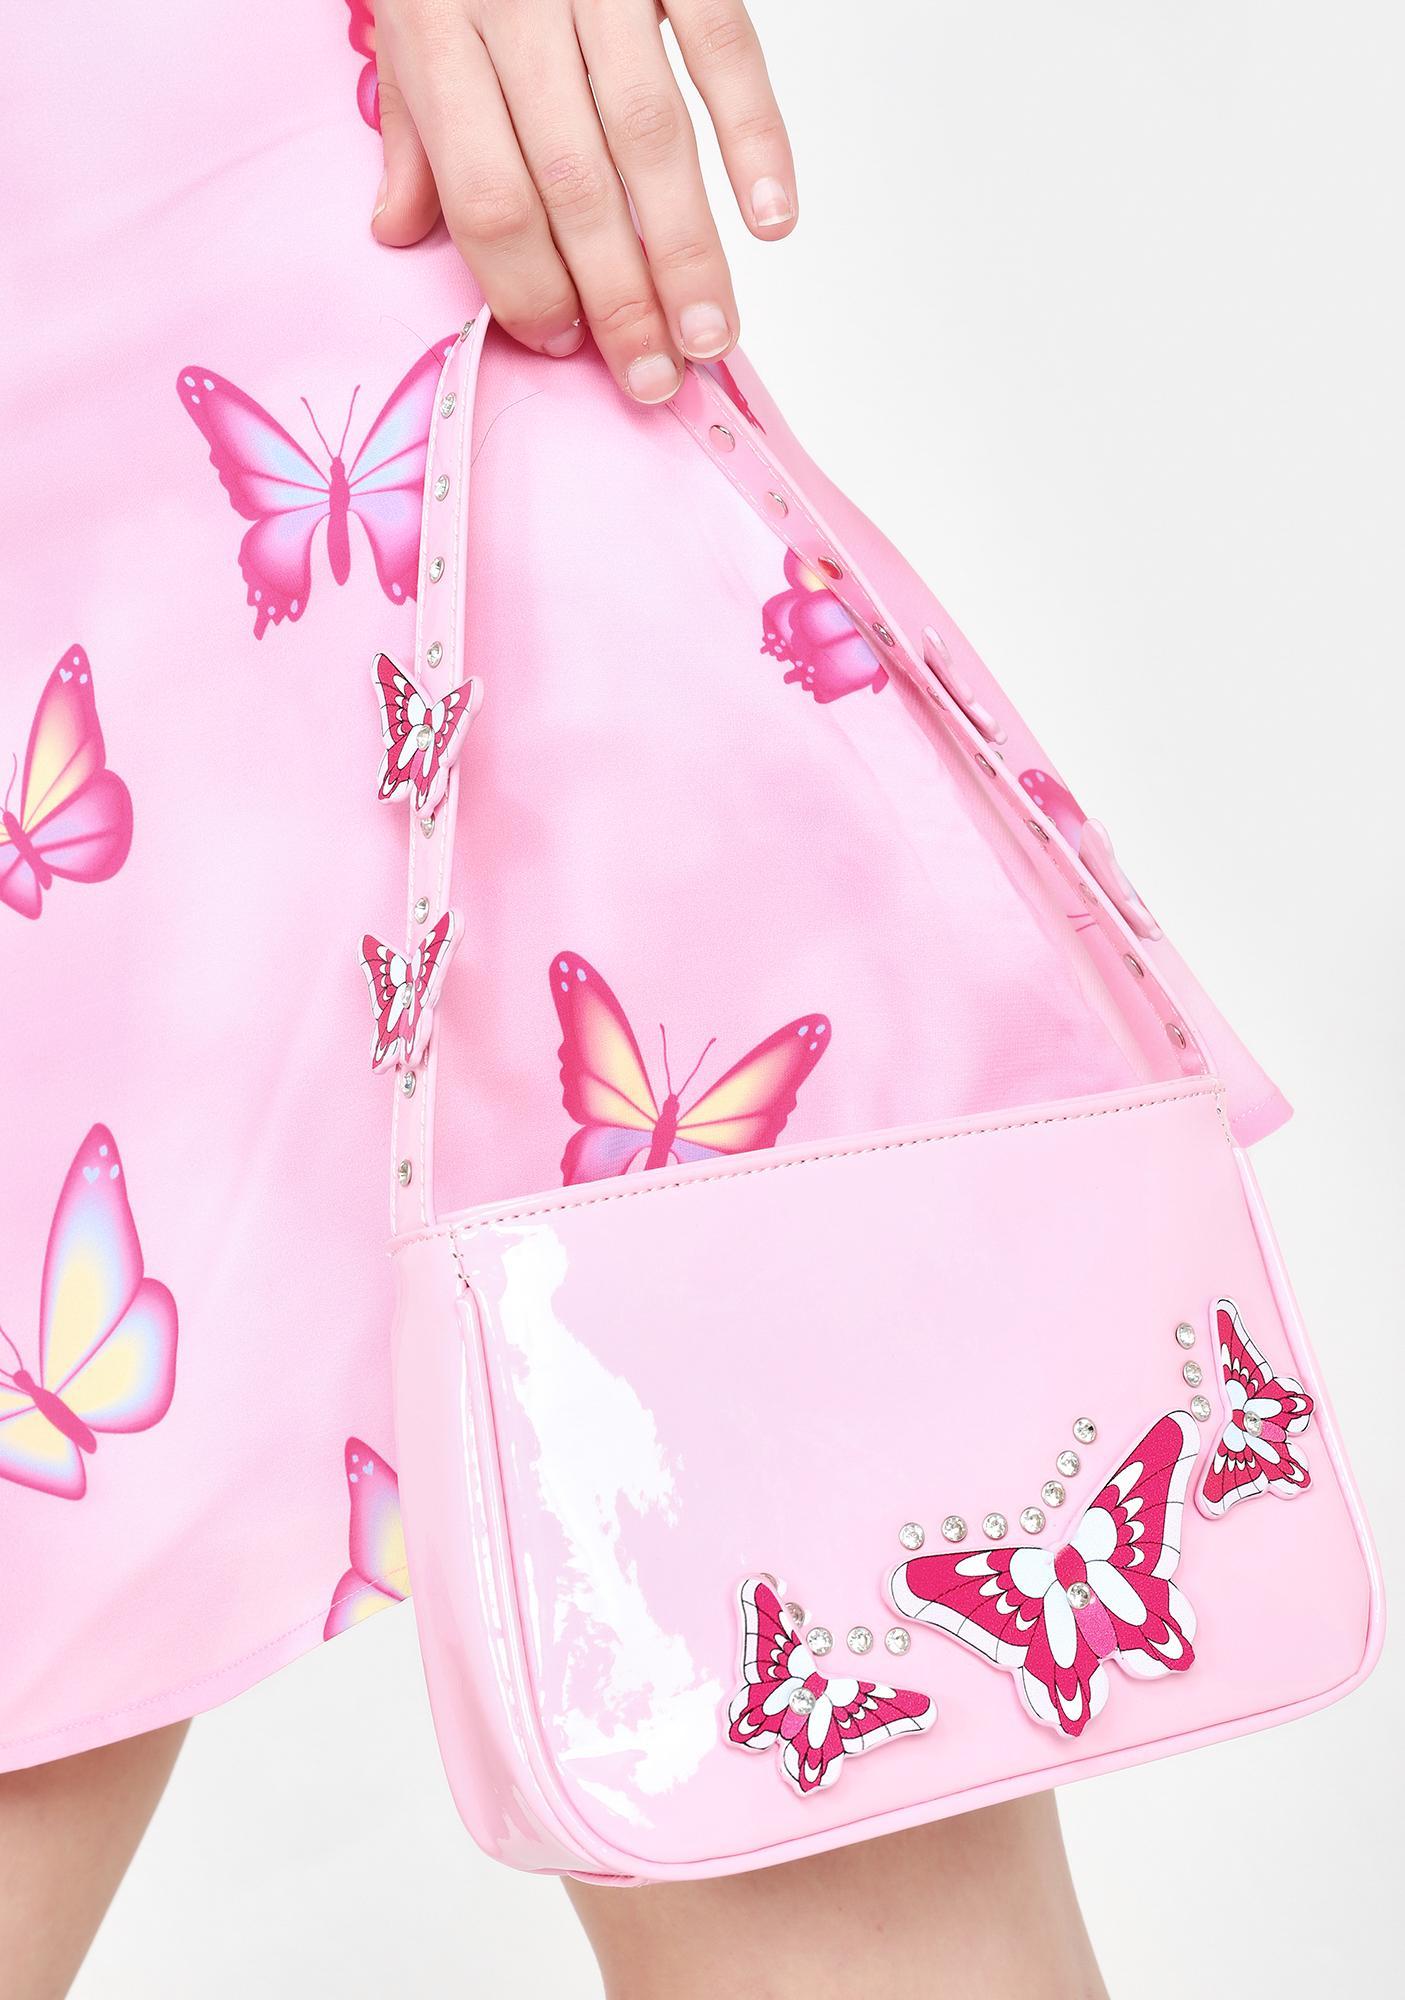 Sugar Thrillz Pampered Pixie Butterfly Purse